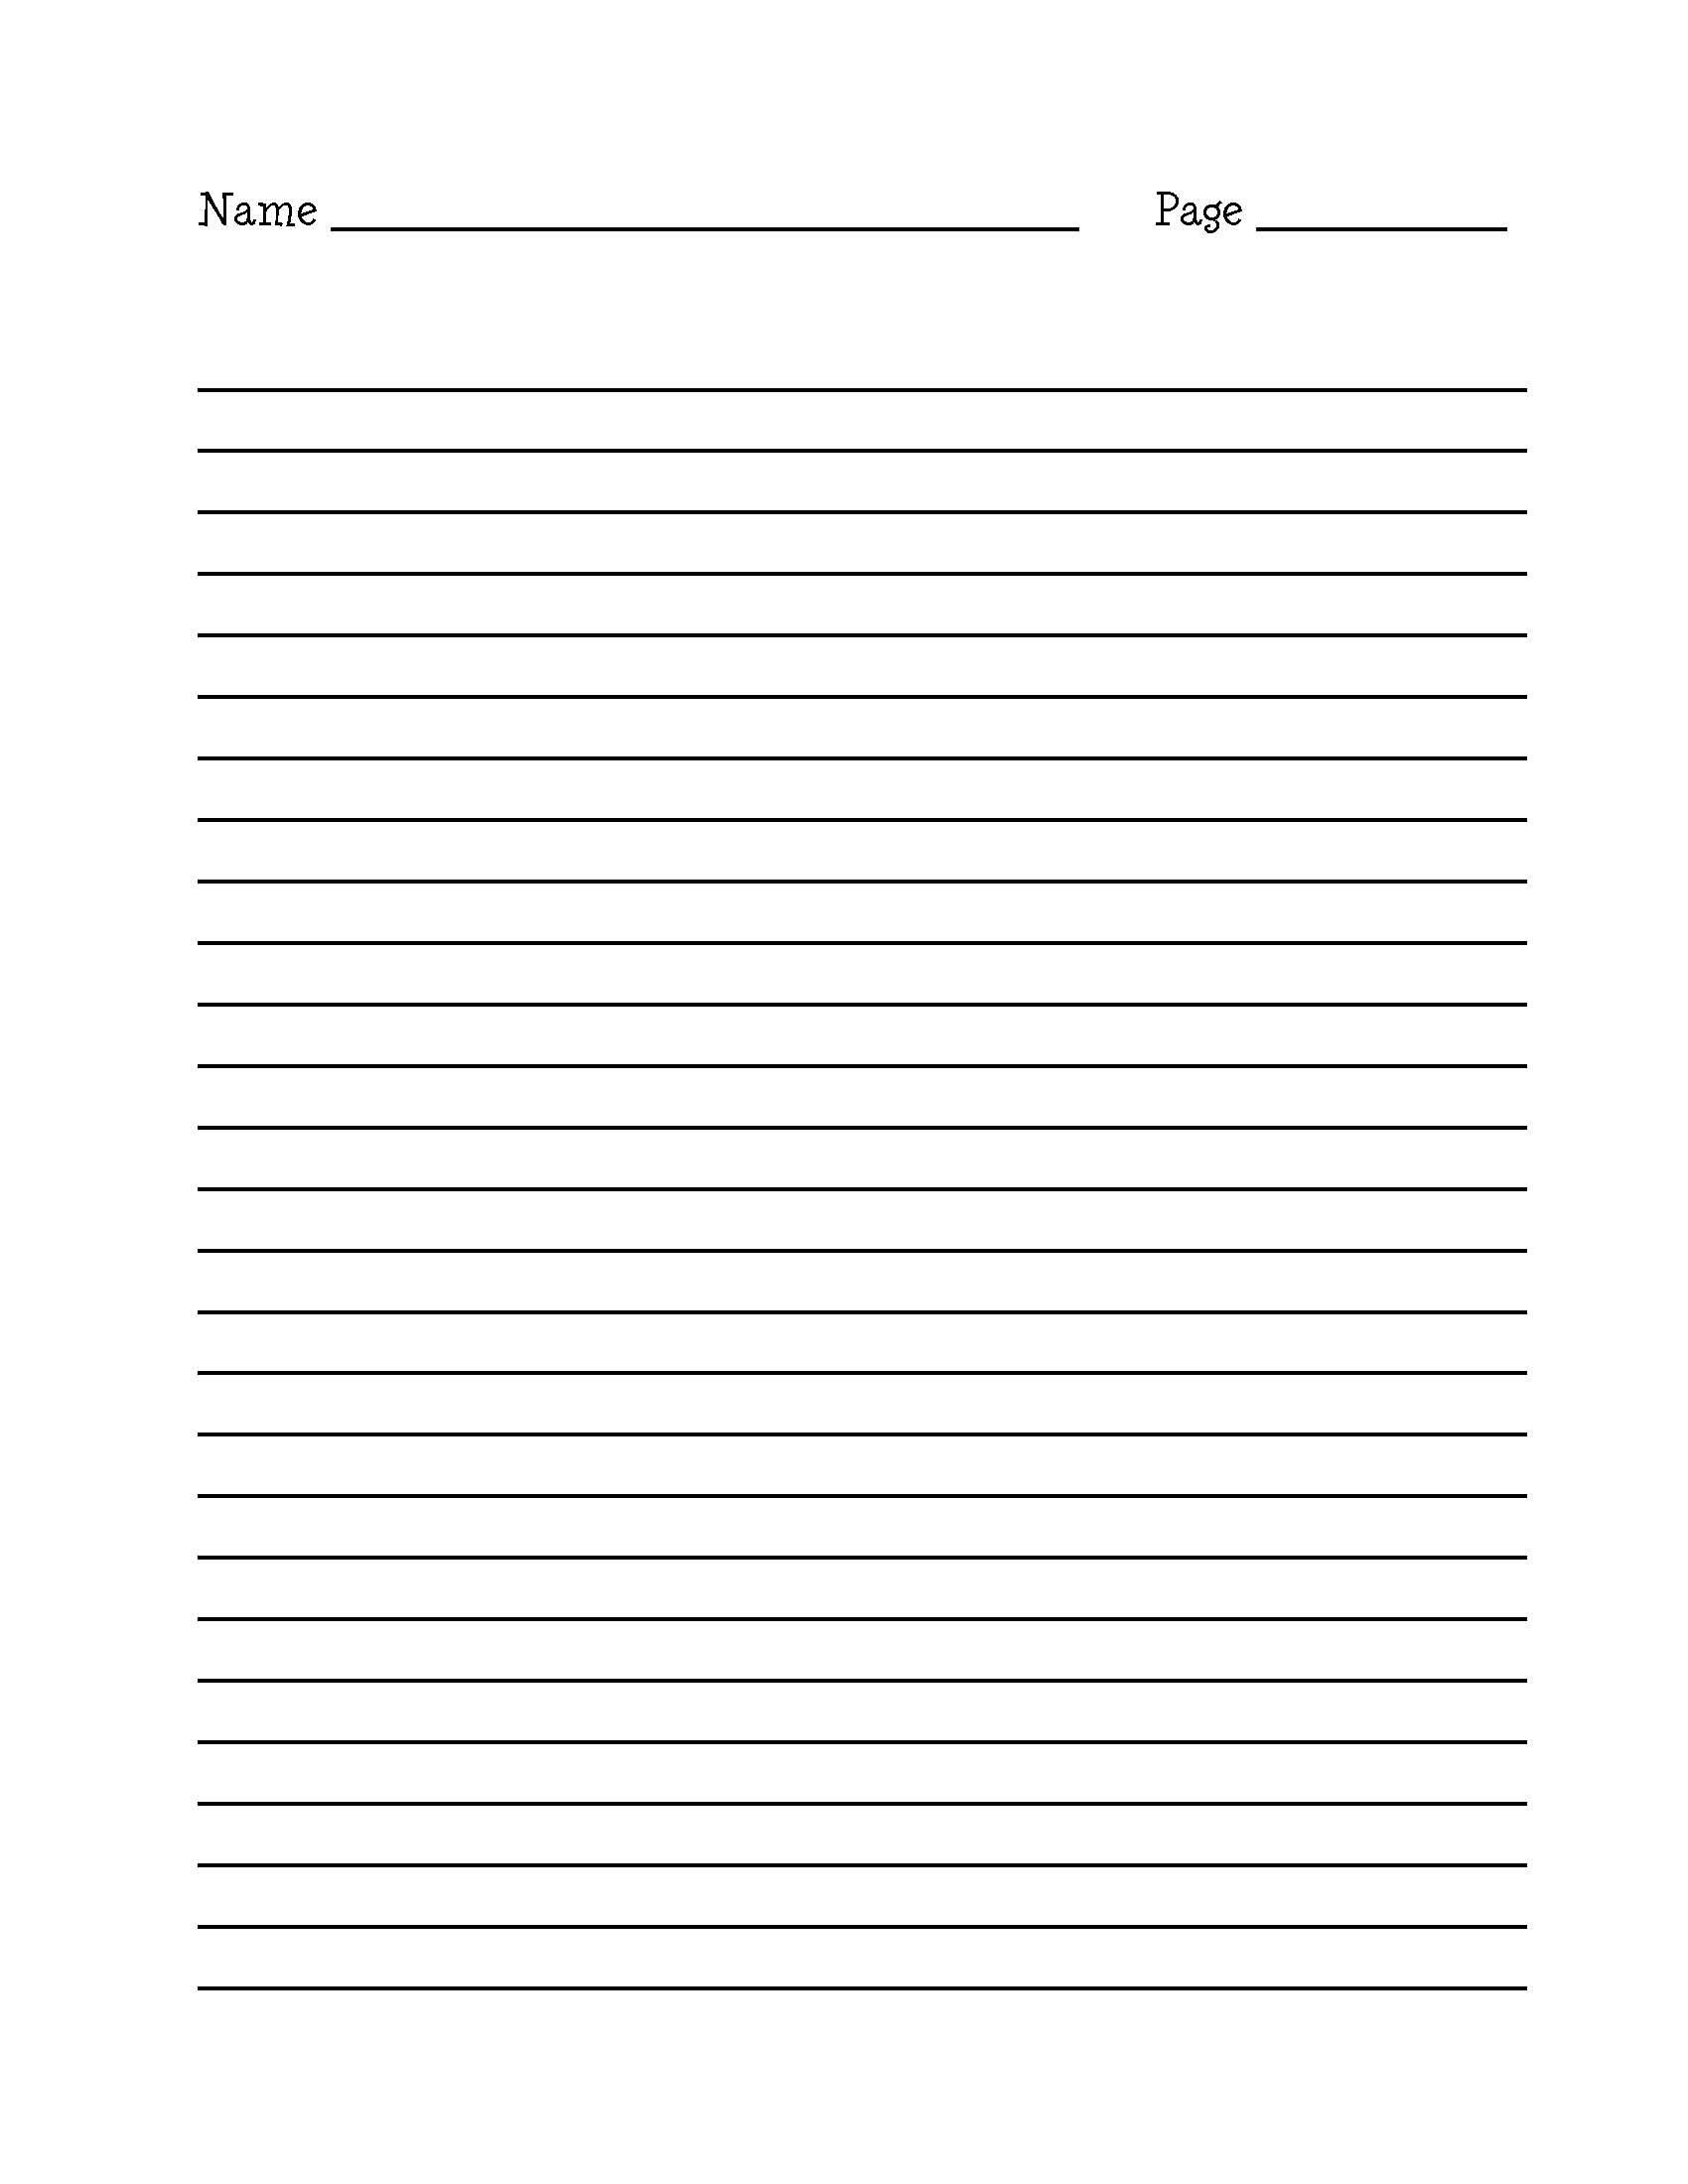 Printable Lined Writing Paper Pdf | Corner Of Chart And Menu - Free Printable Lined Writing Paper